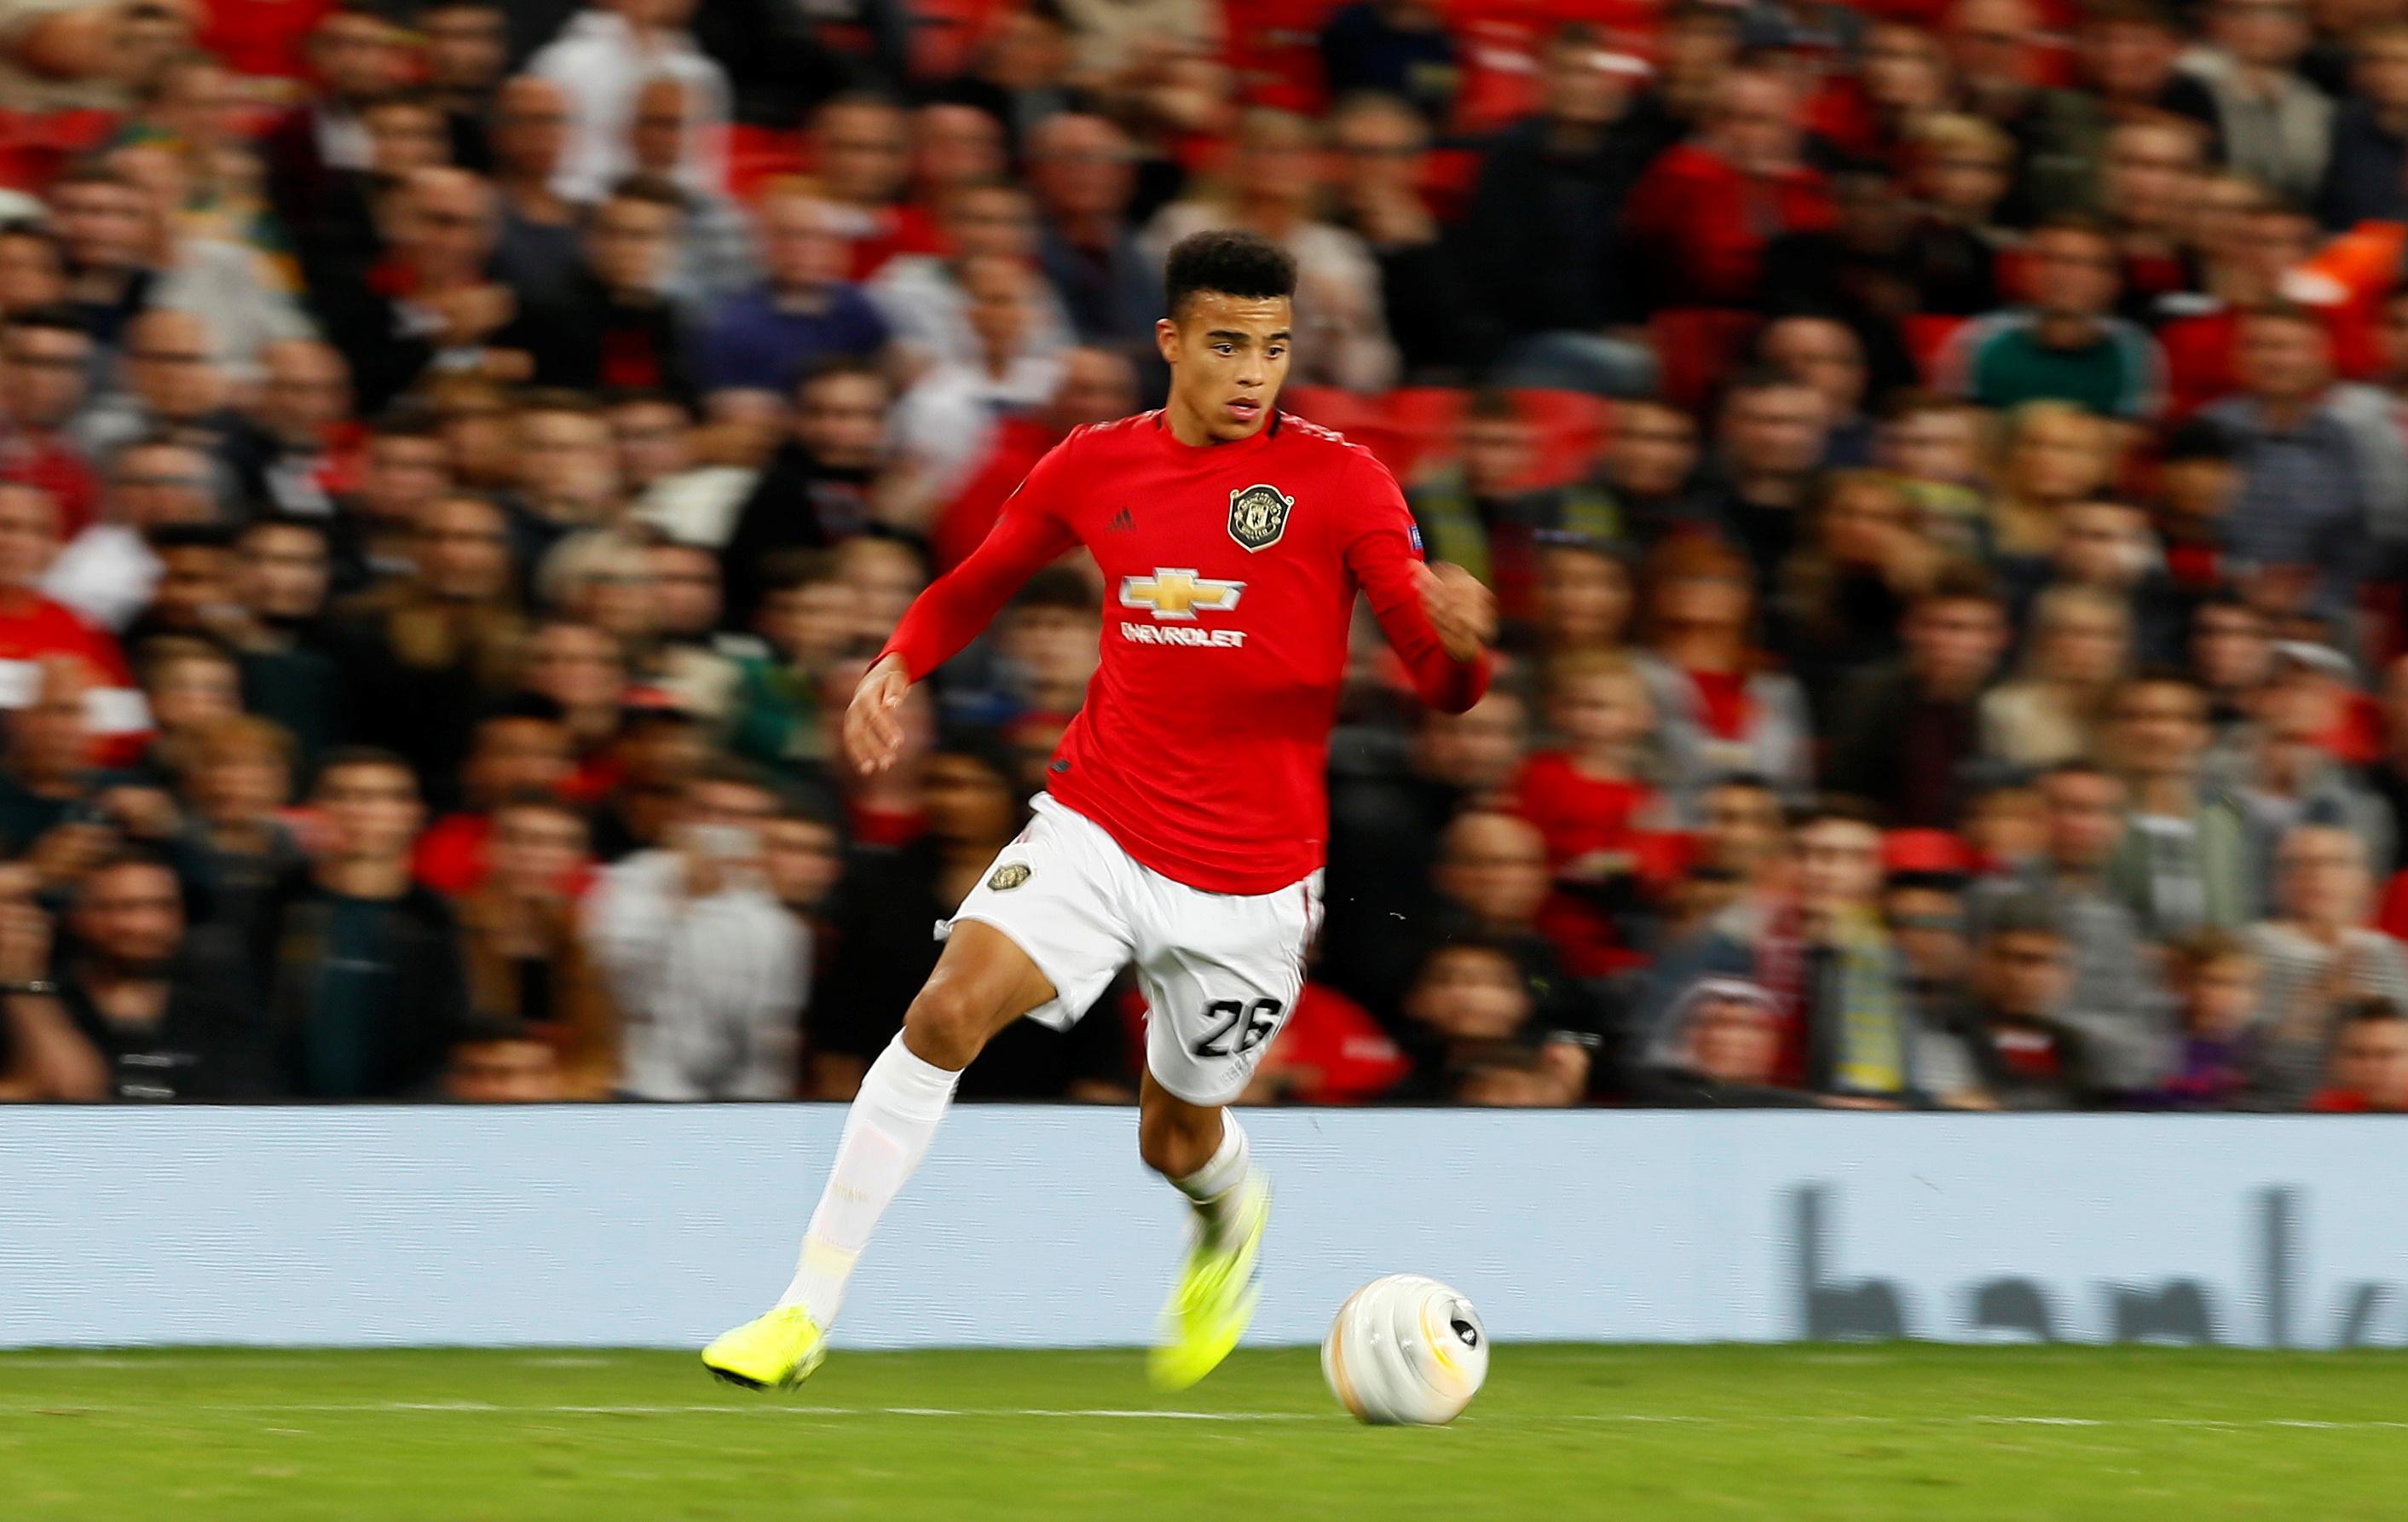 Man United boss backs goalscorer Greenwood to play key role